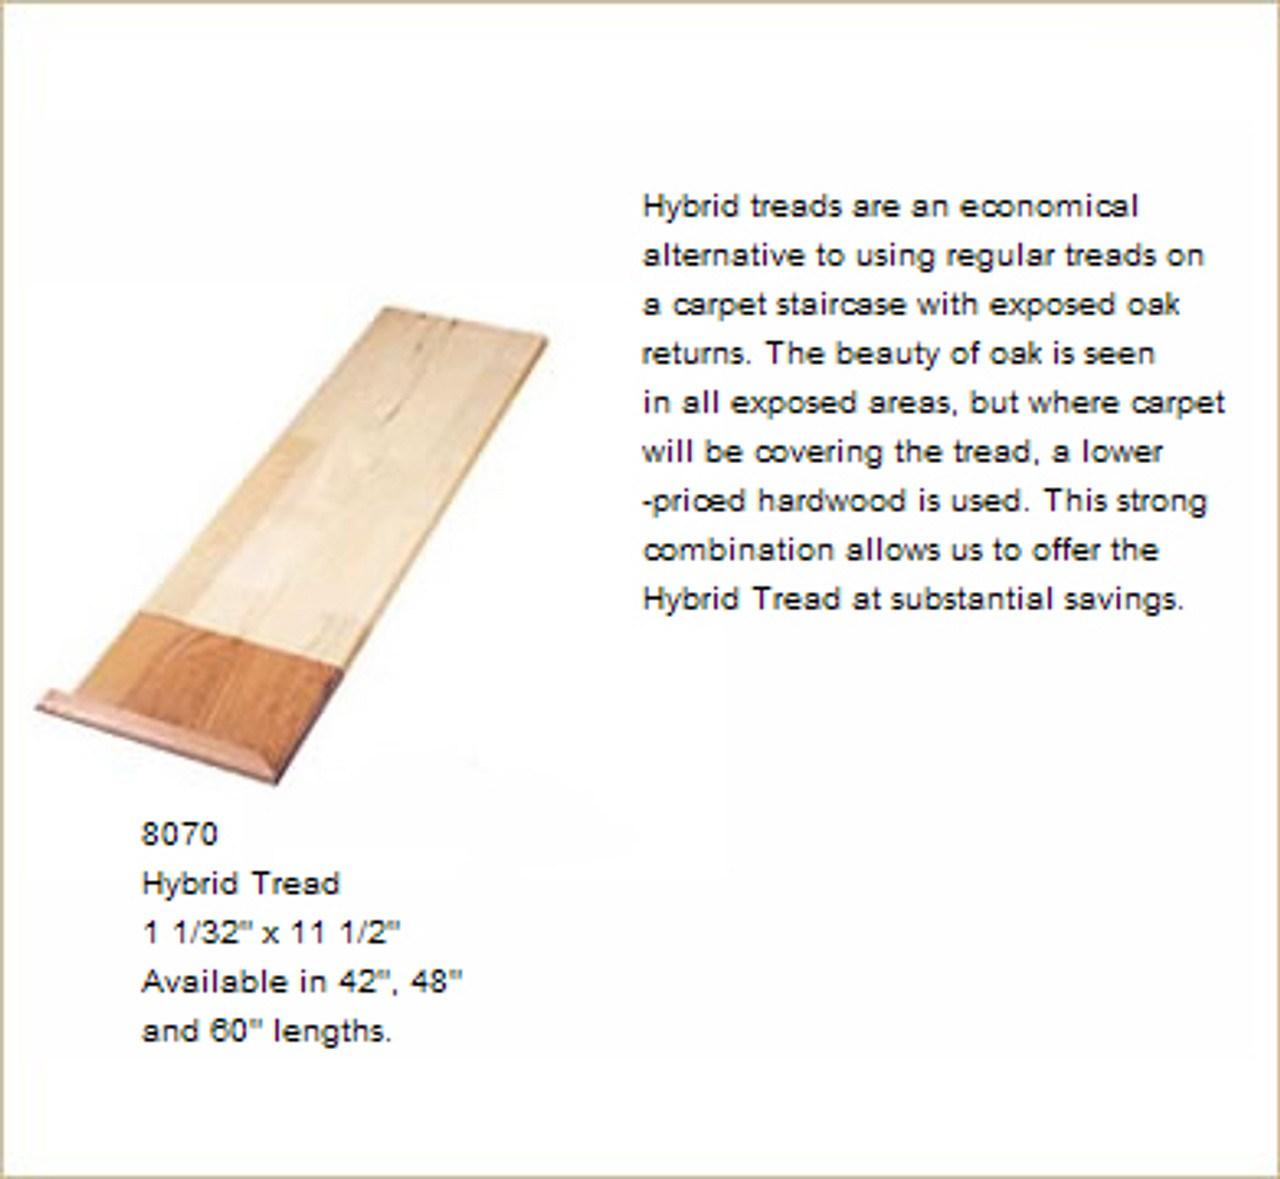 8070Ht 48 Red Oak Hybrid Stair Tread | 42 Oak Stair Treads | Stair Parts | Wood | White Oak Unfinished | Modern Retro | Lowes